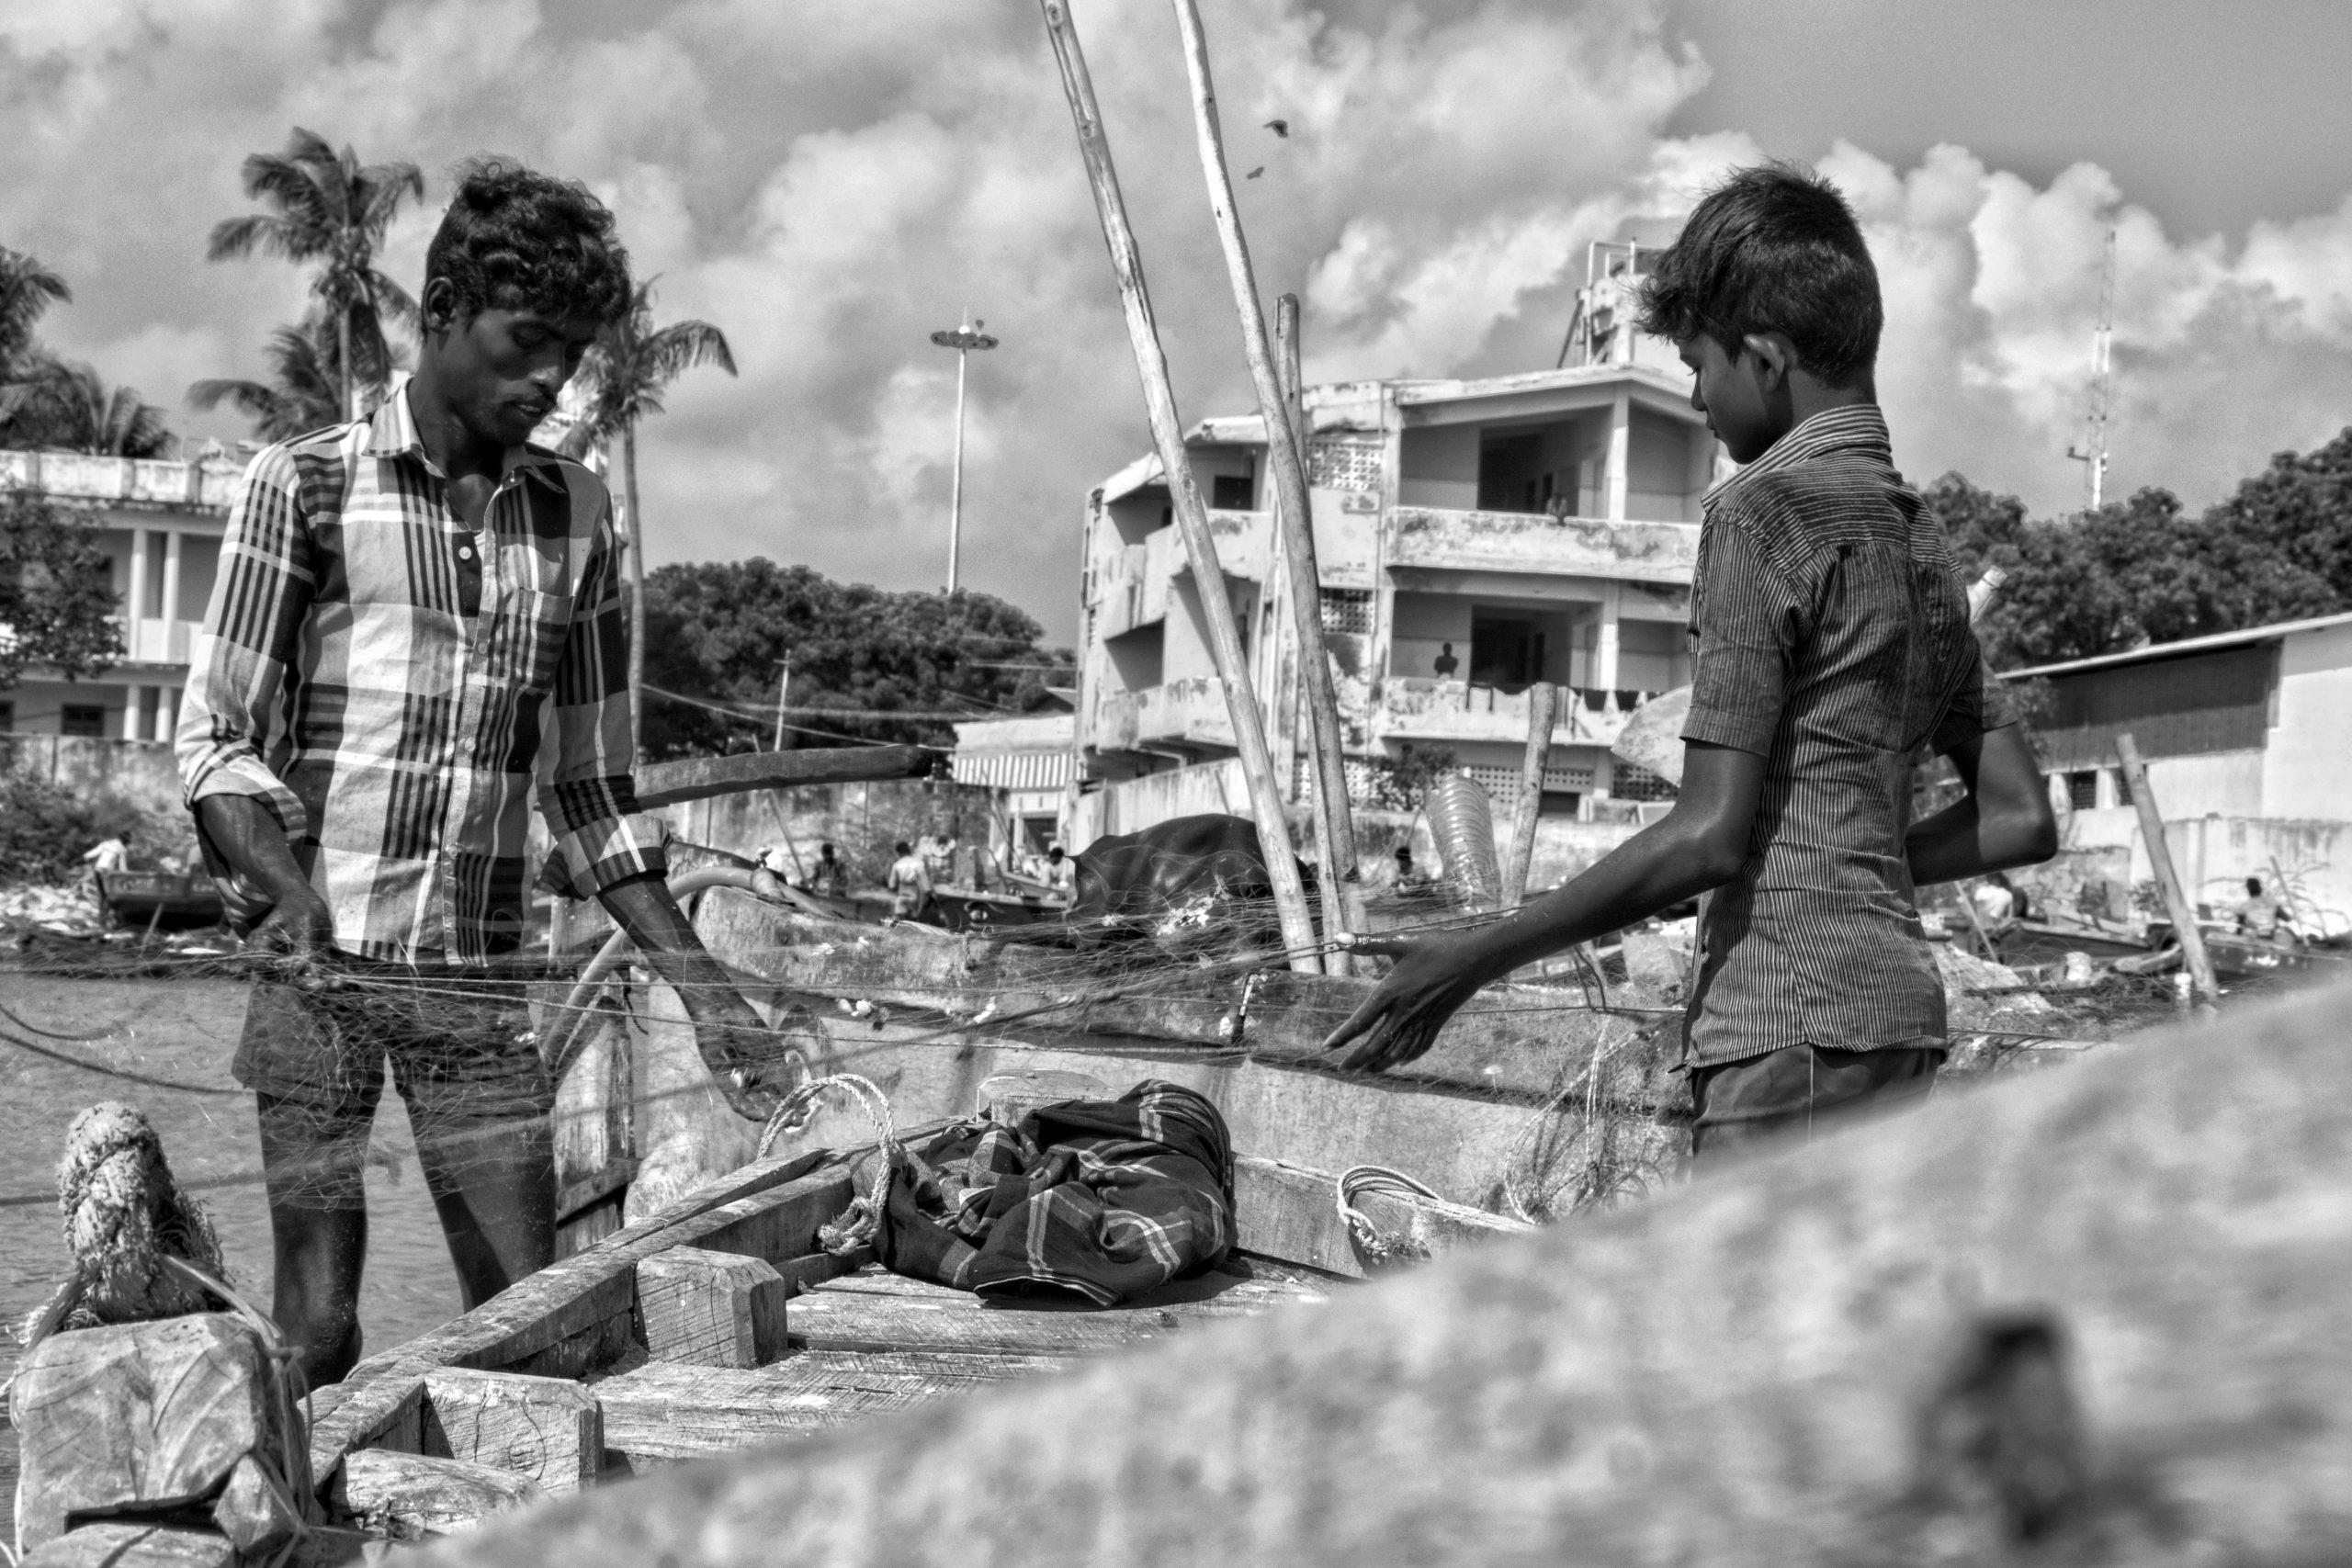 Fishermen arranging fishing net